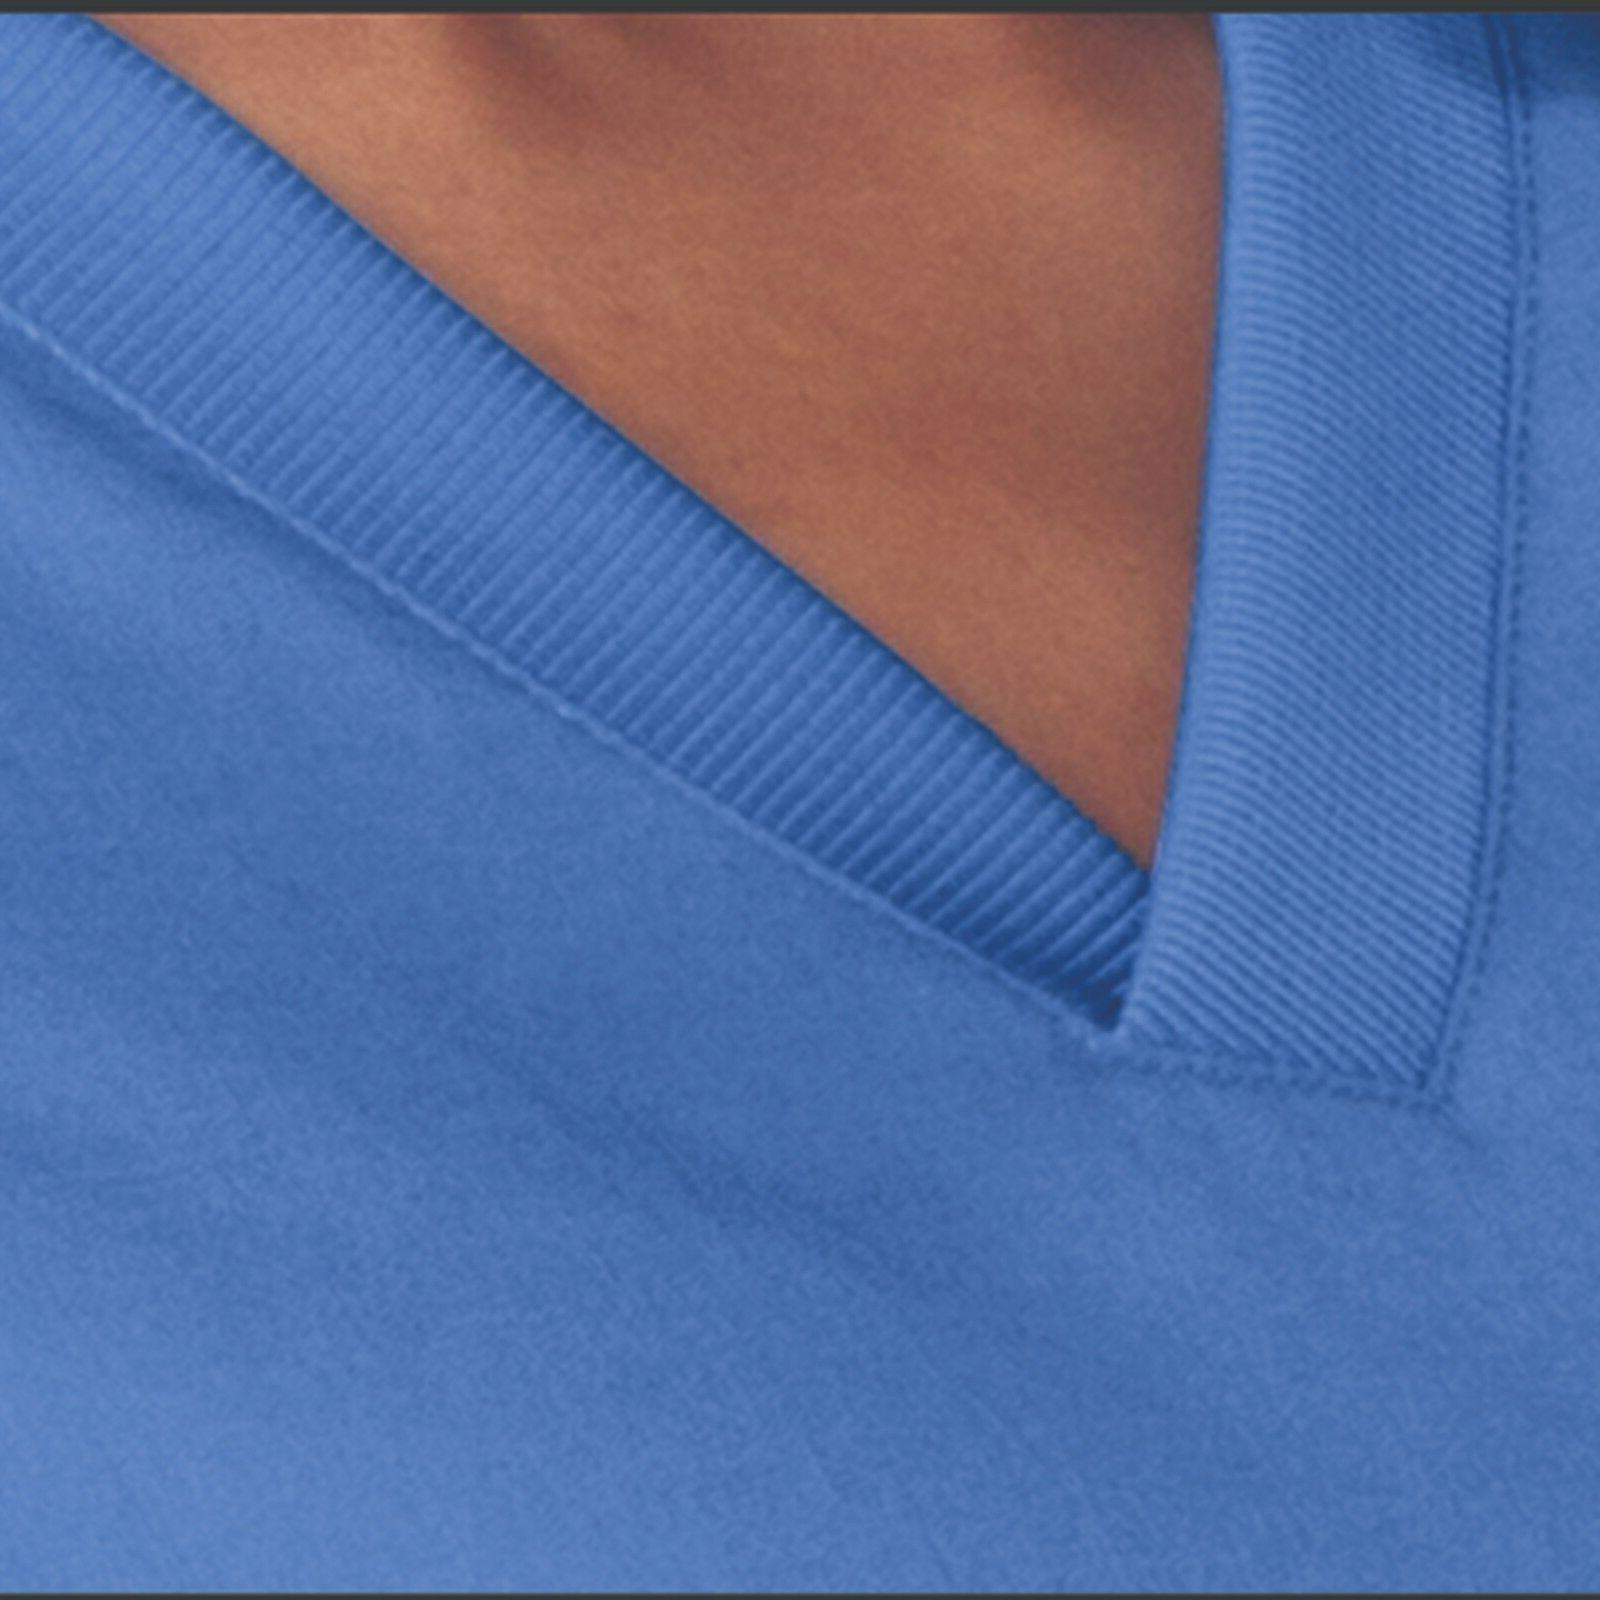 Cherokee Scrubs Uniform Workwear Fit V-Neck Top